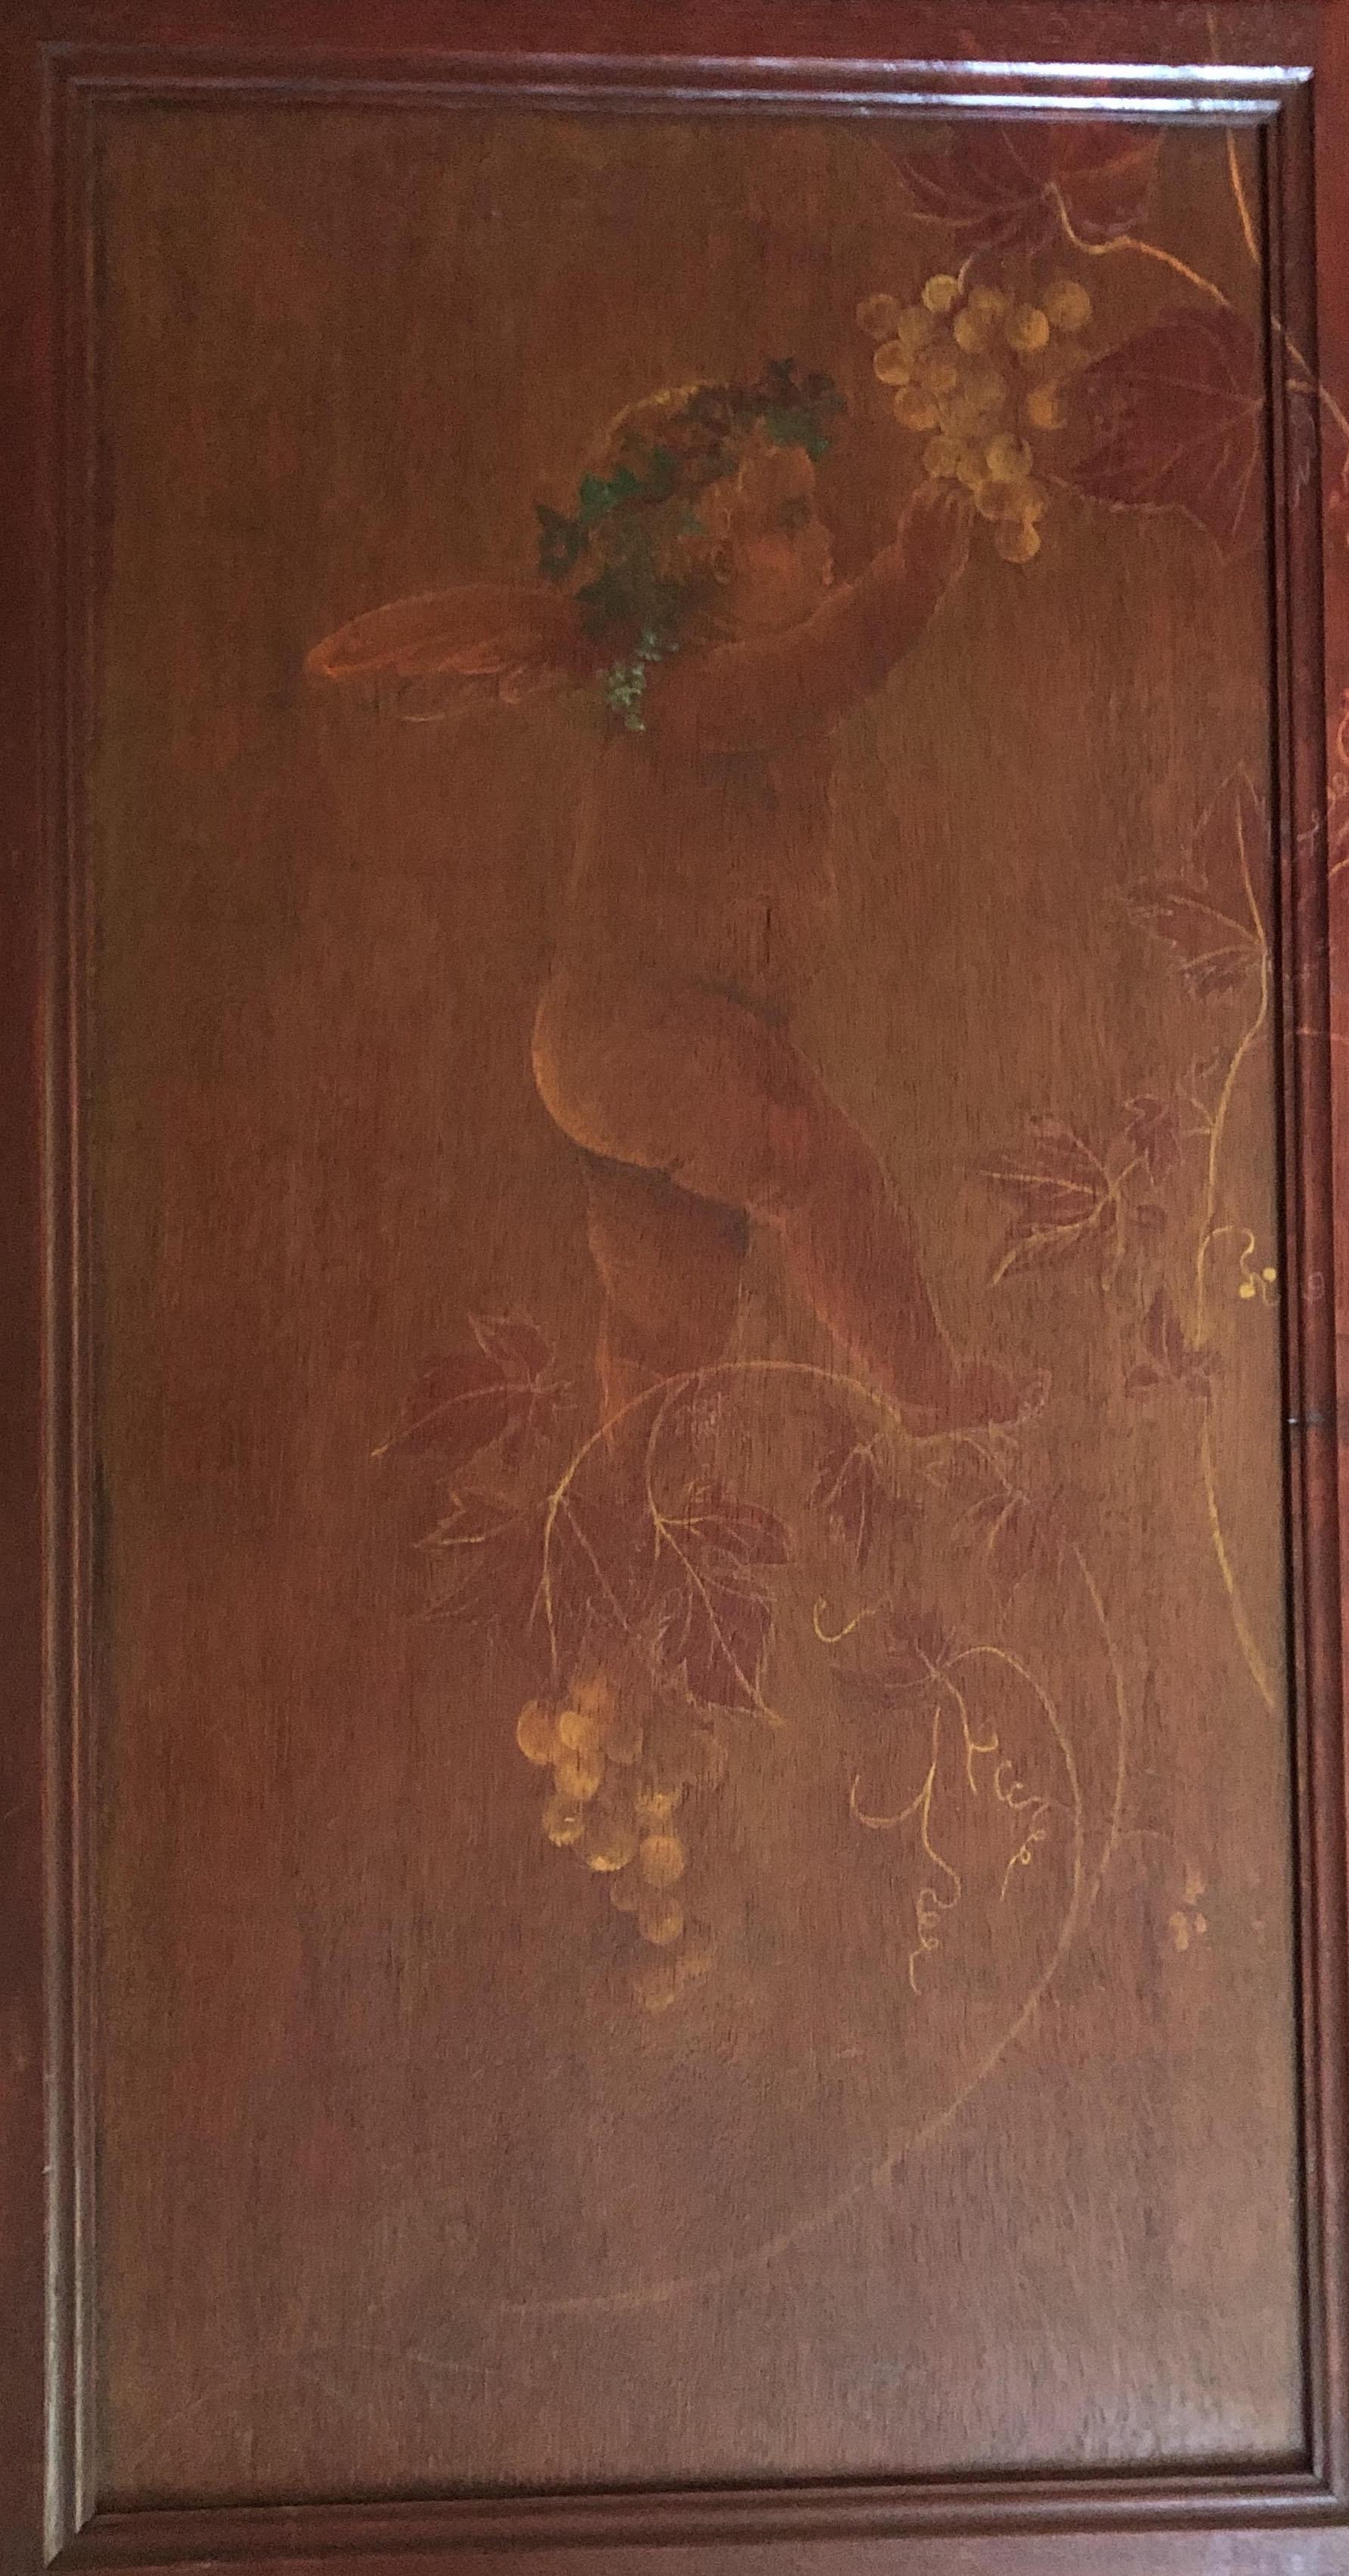 Angelot cueillant du raisin